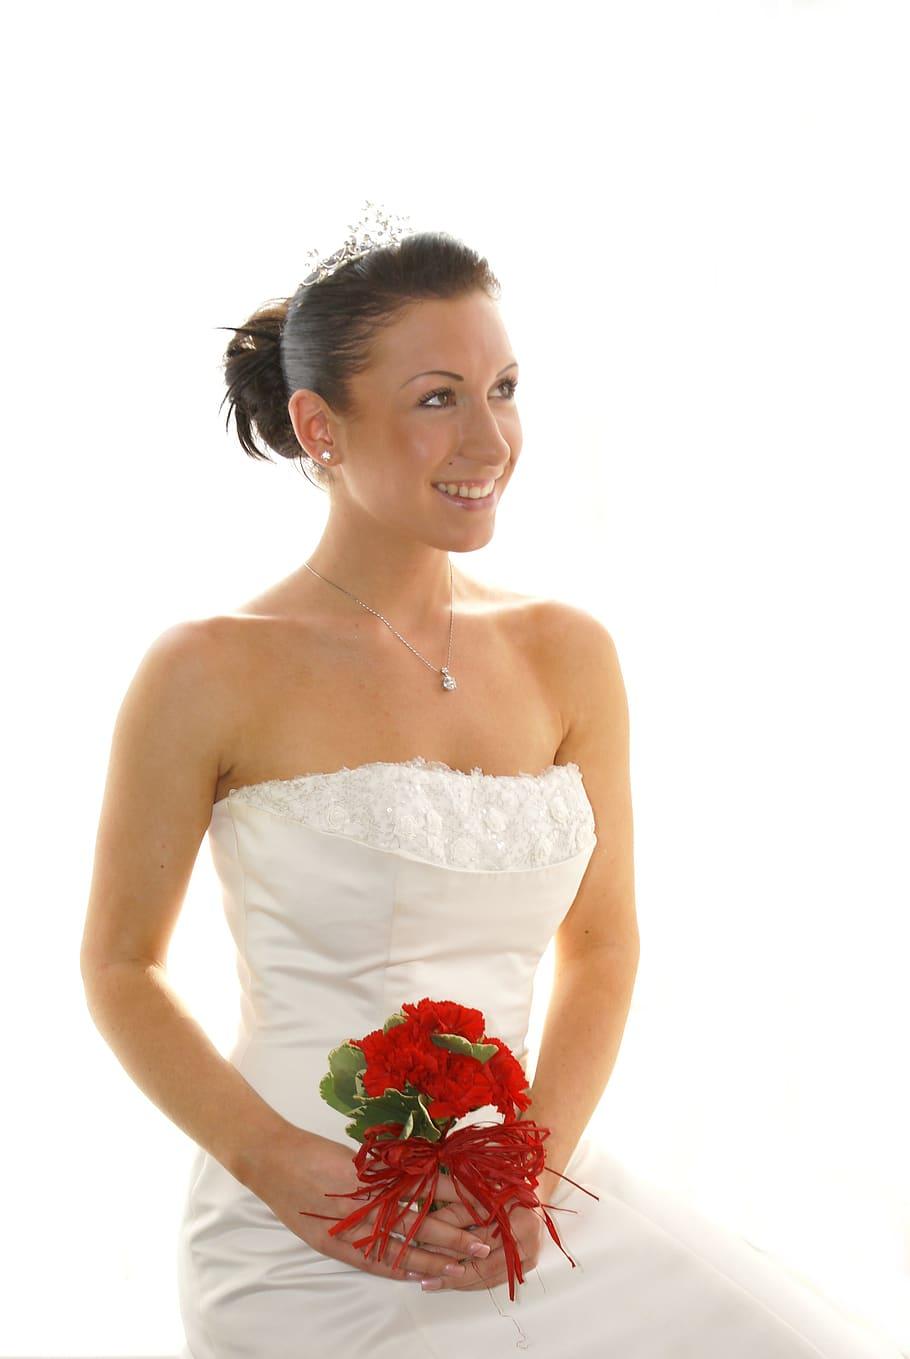 bride-wedding-woman-love-bridal-gown